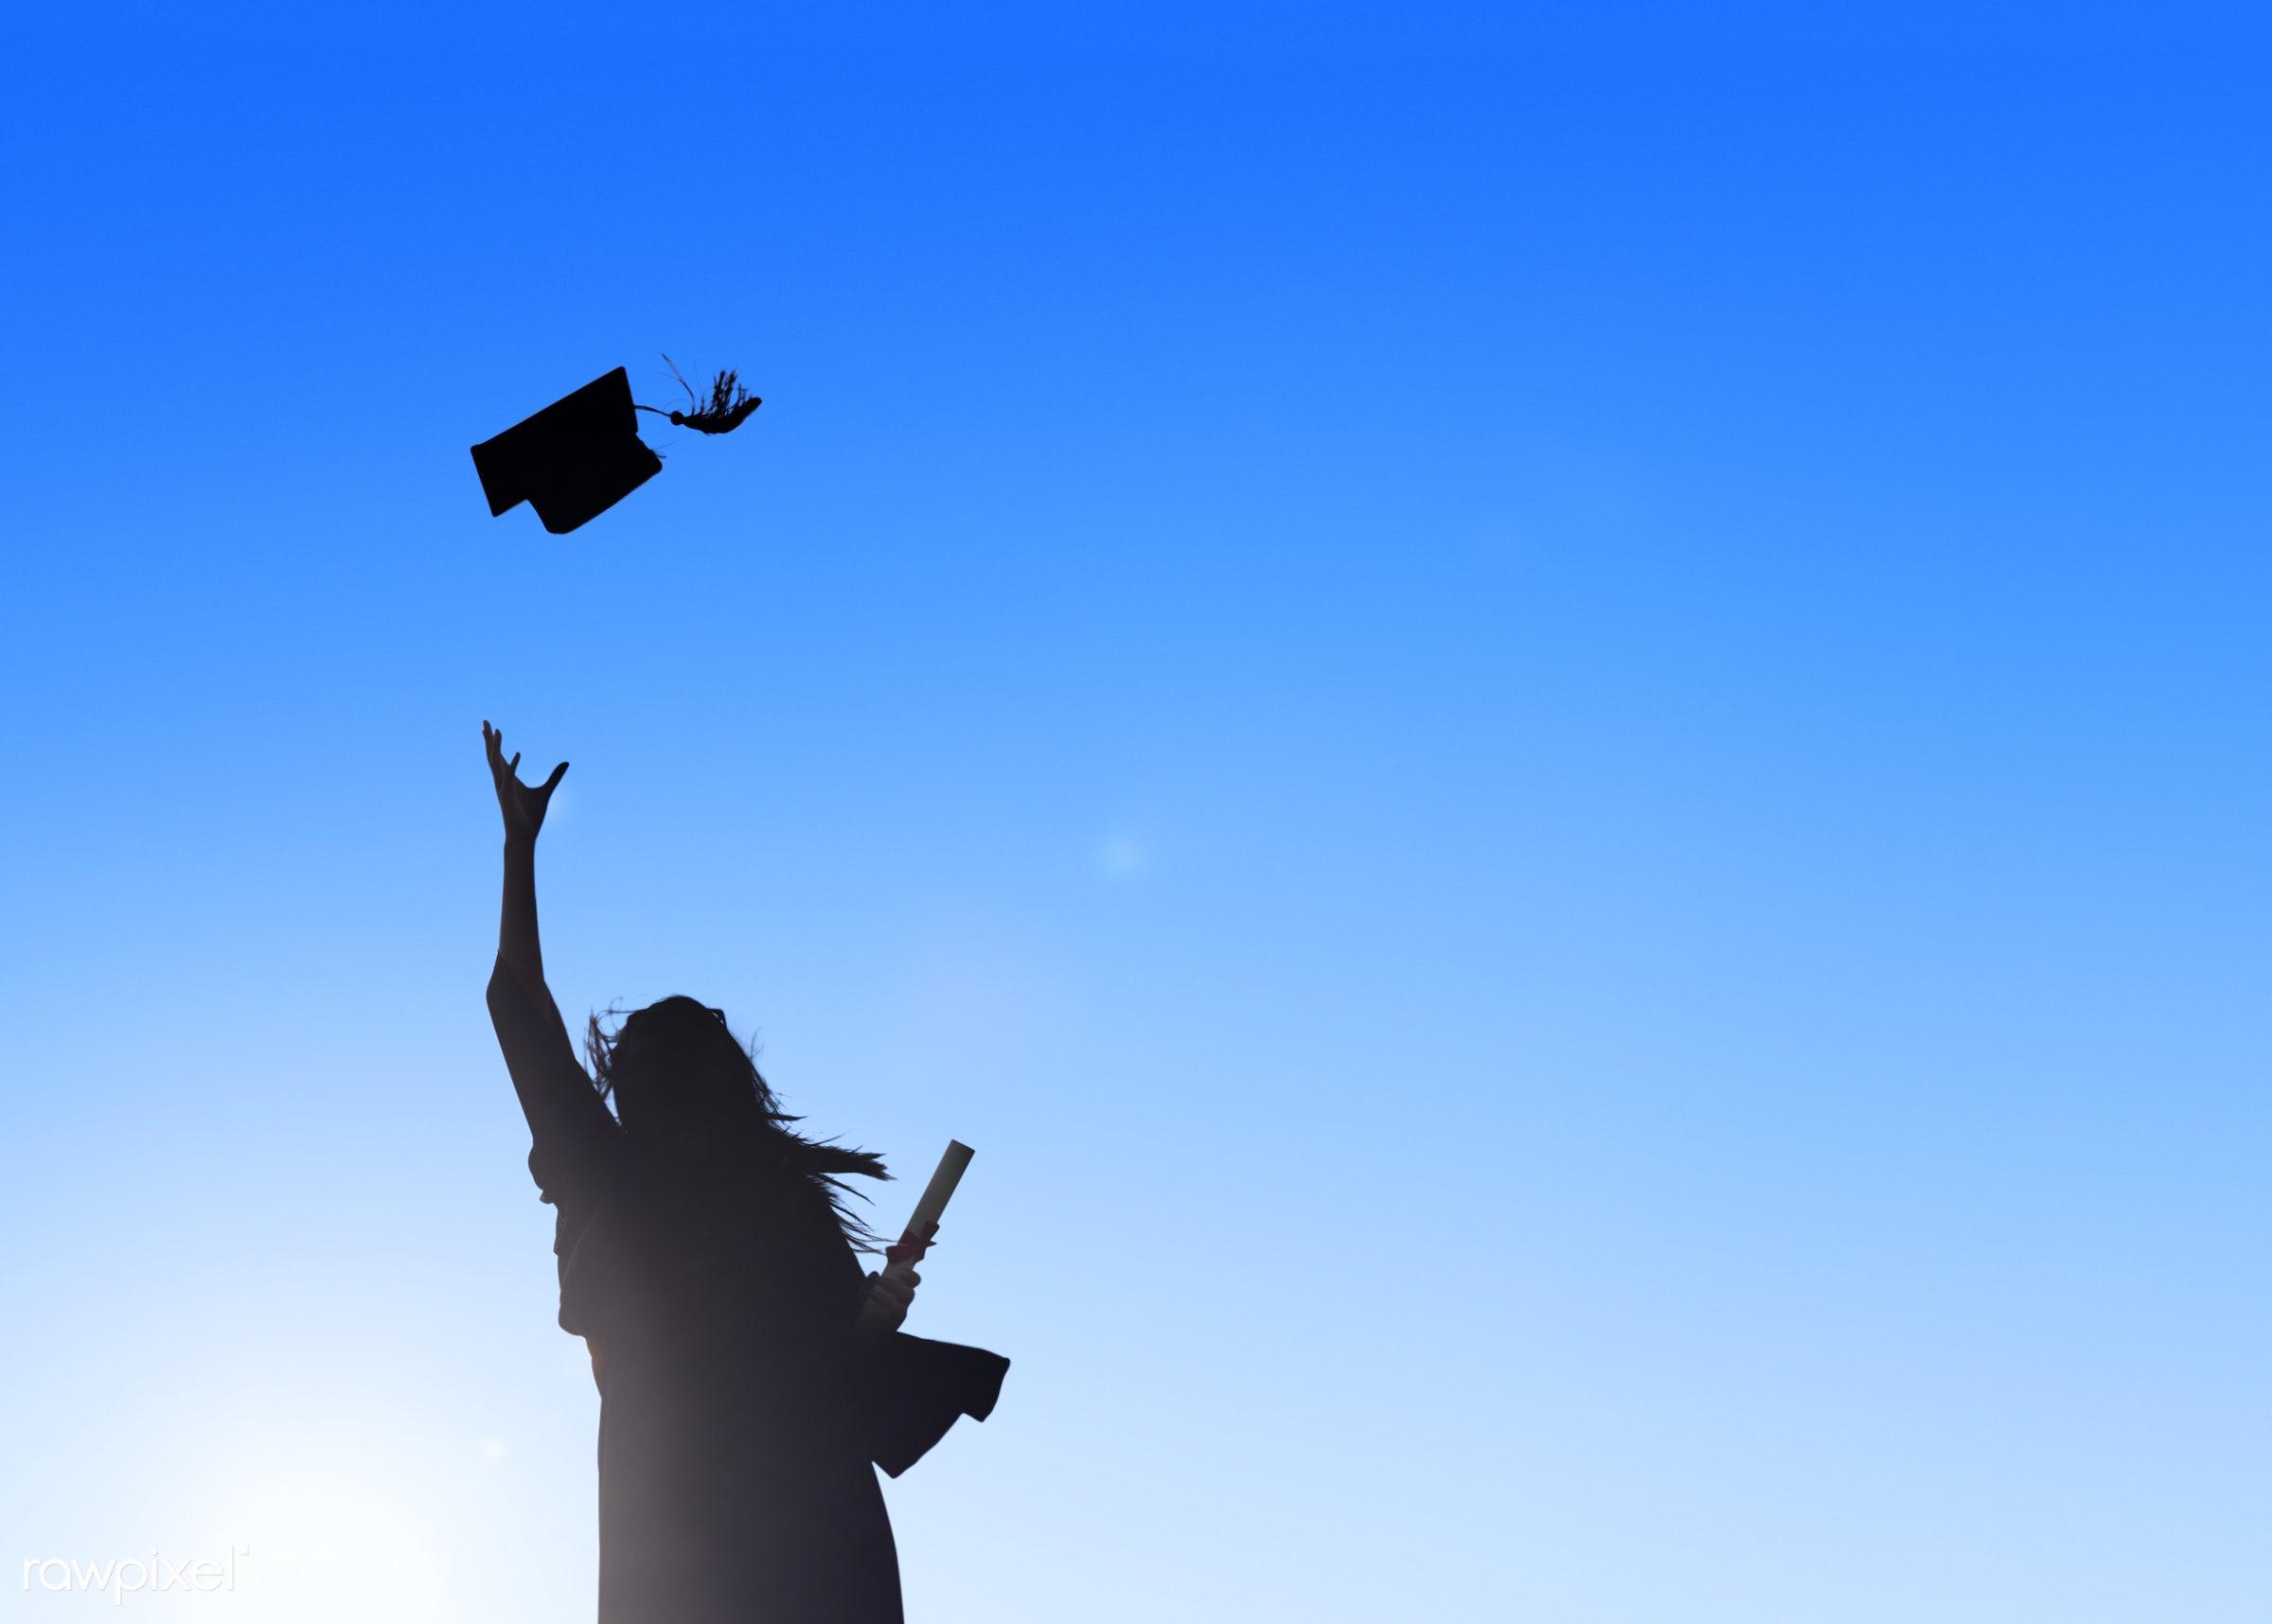 hat, academic, achievement, blank, campus, cap, celebration, ceremony, certificate, cheerful, college, college student,...